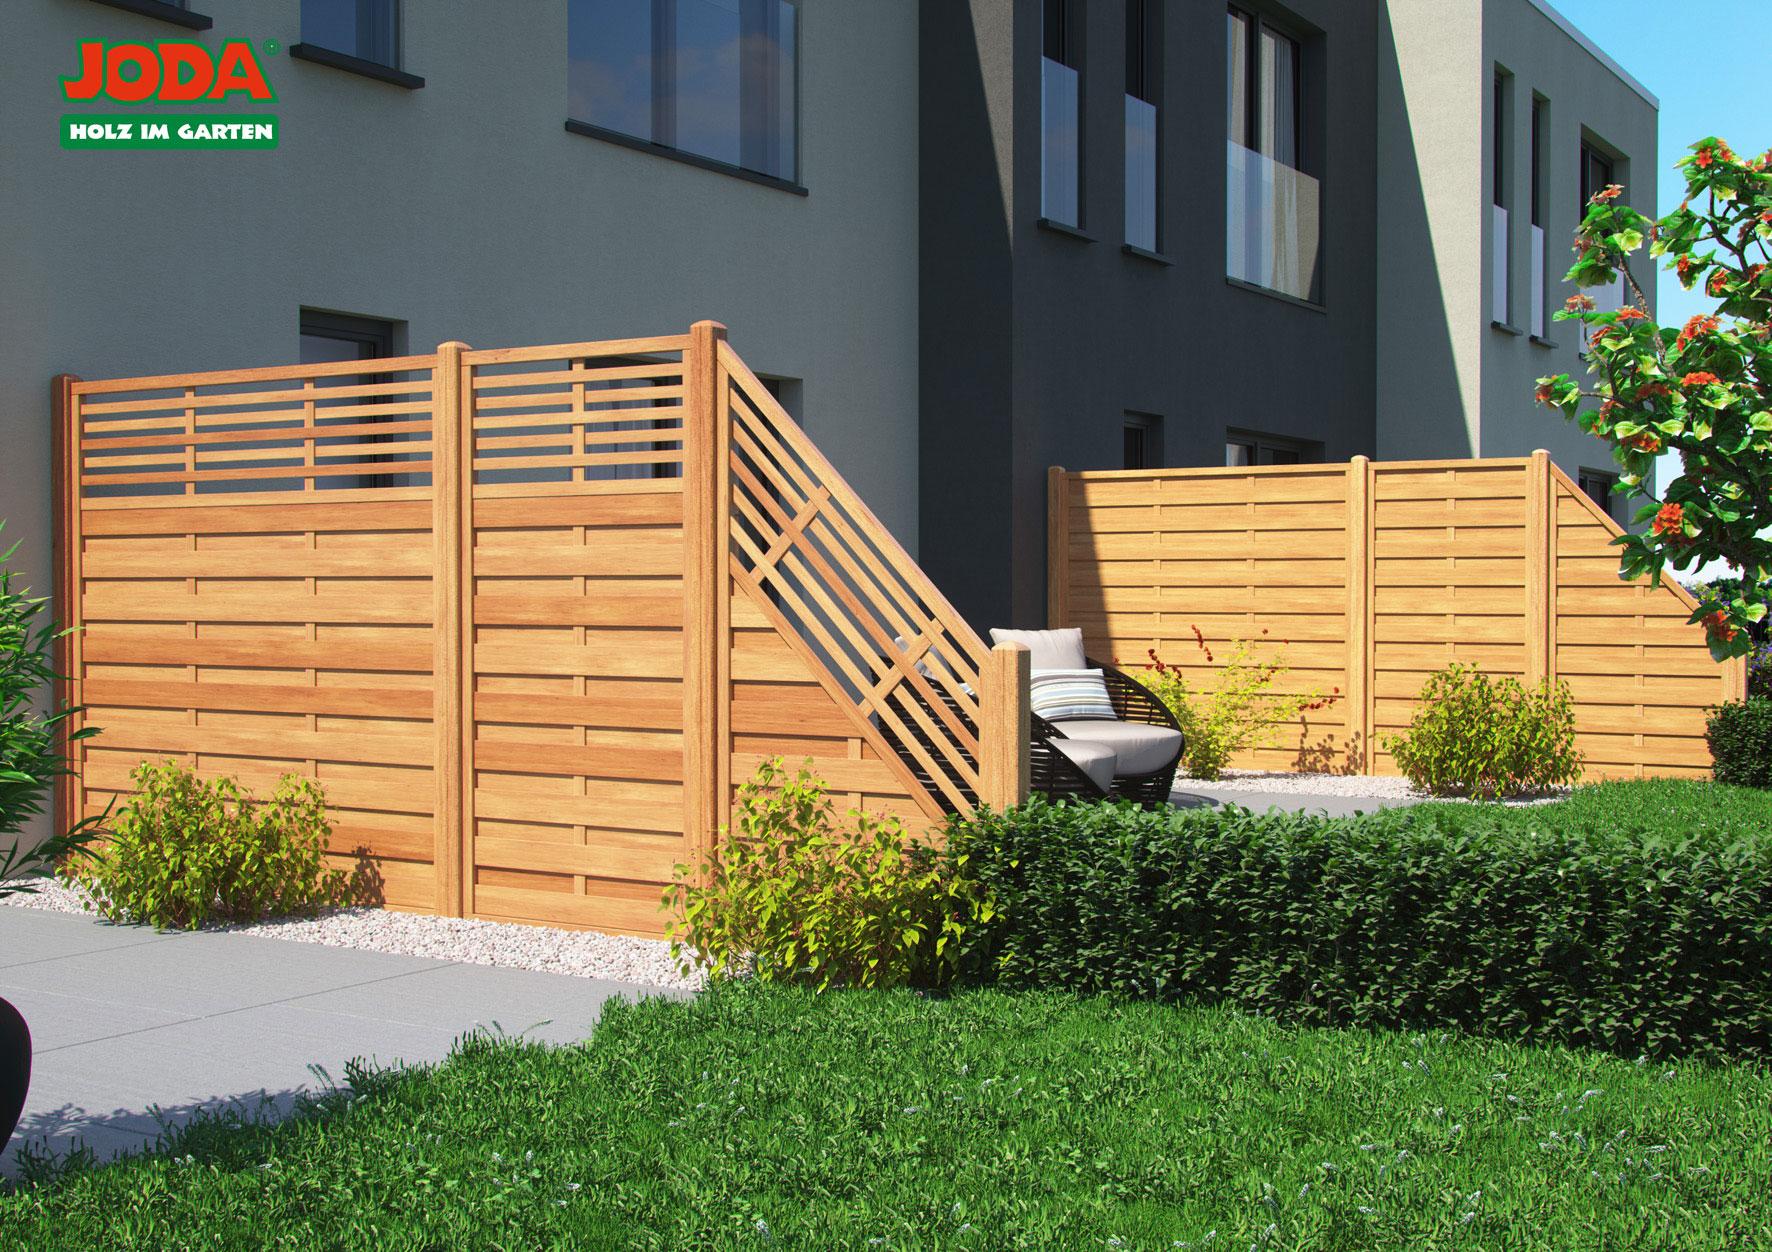 Sichtschutzelemente Zaune Holz Dahlinger Joda Holz Im Garten